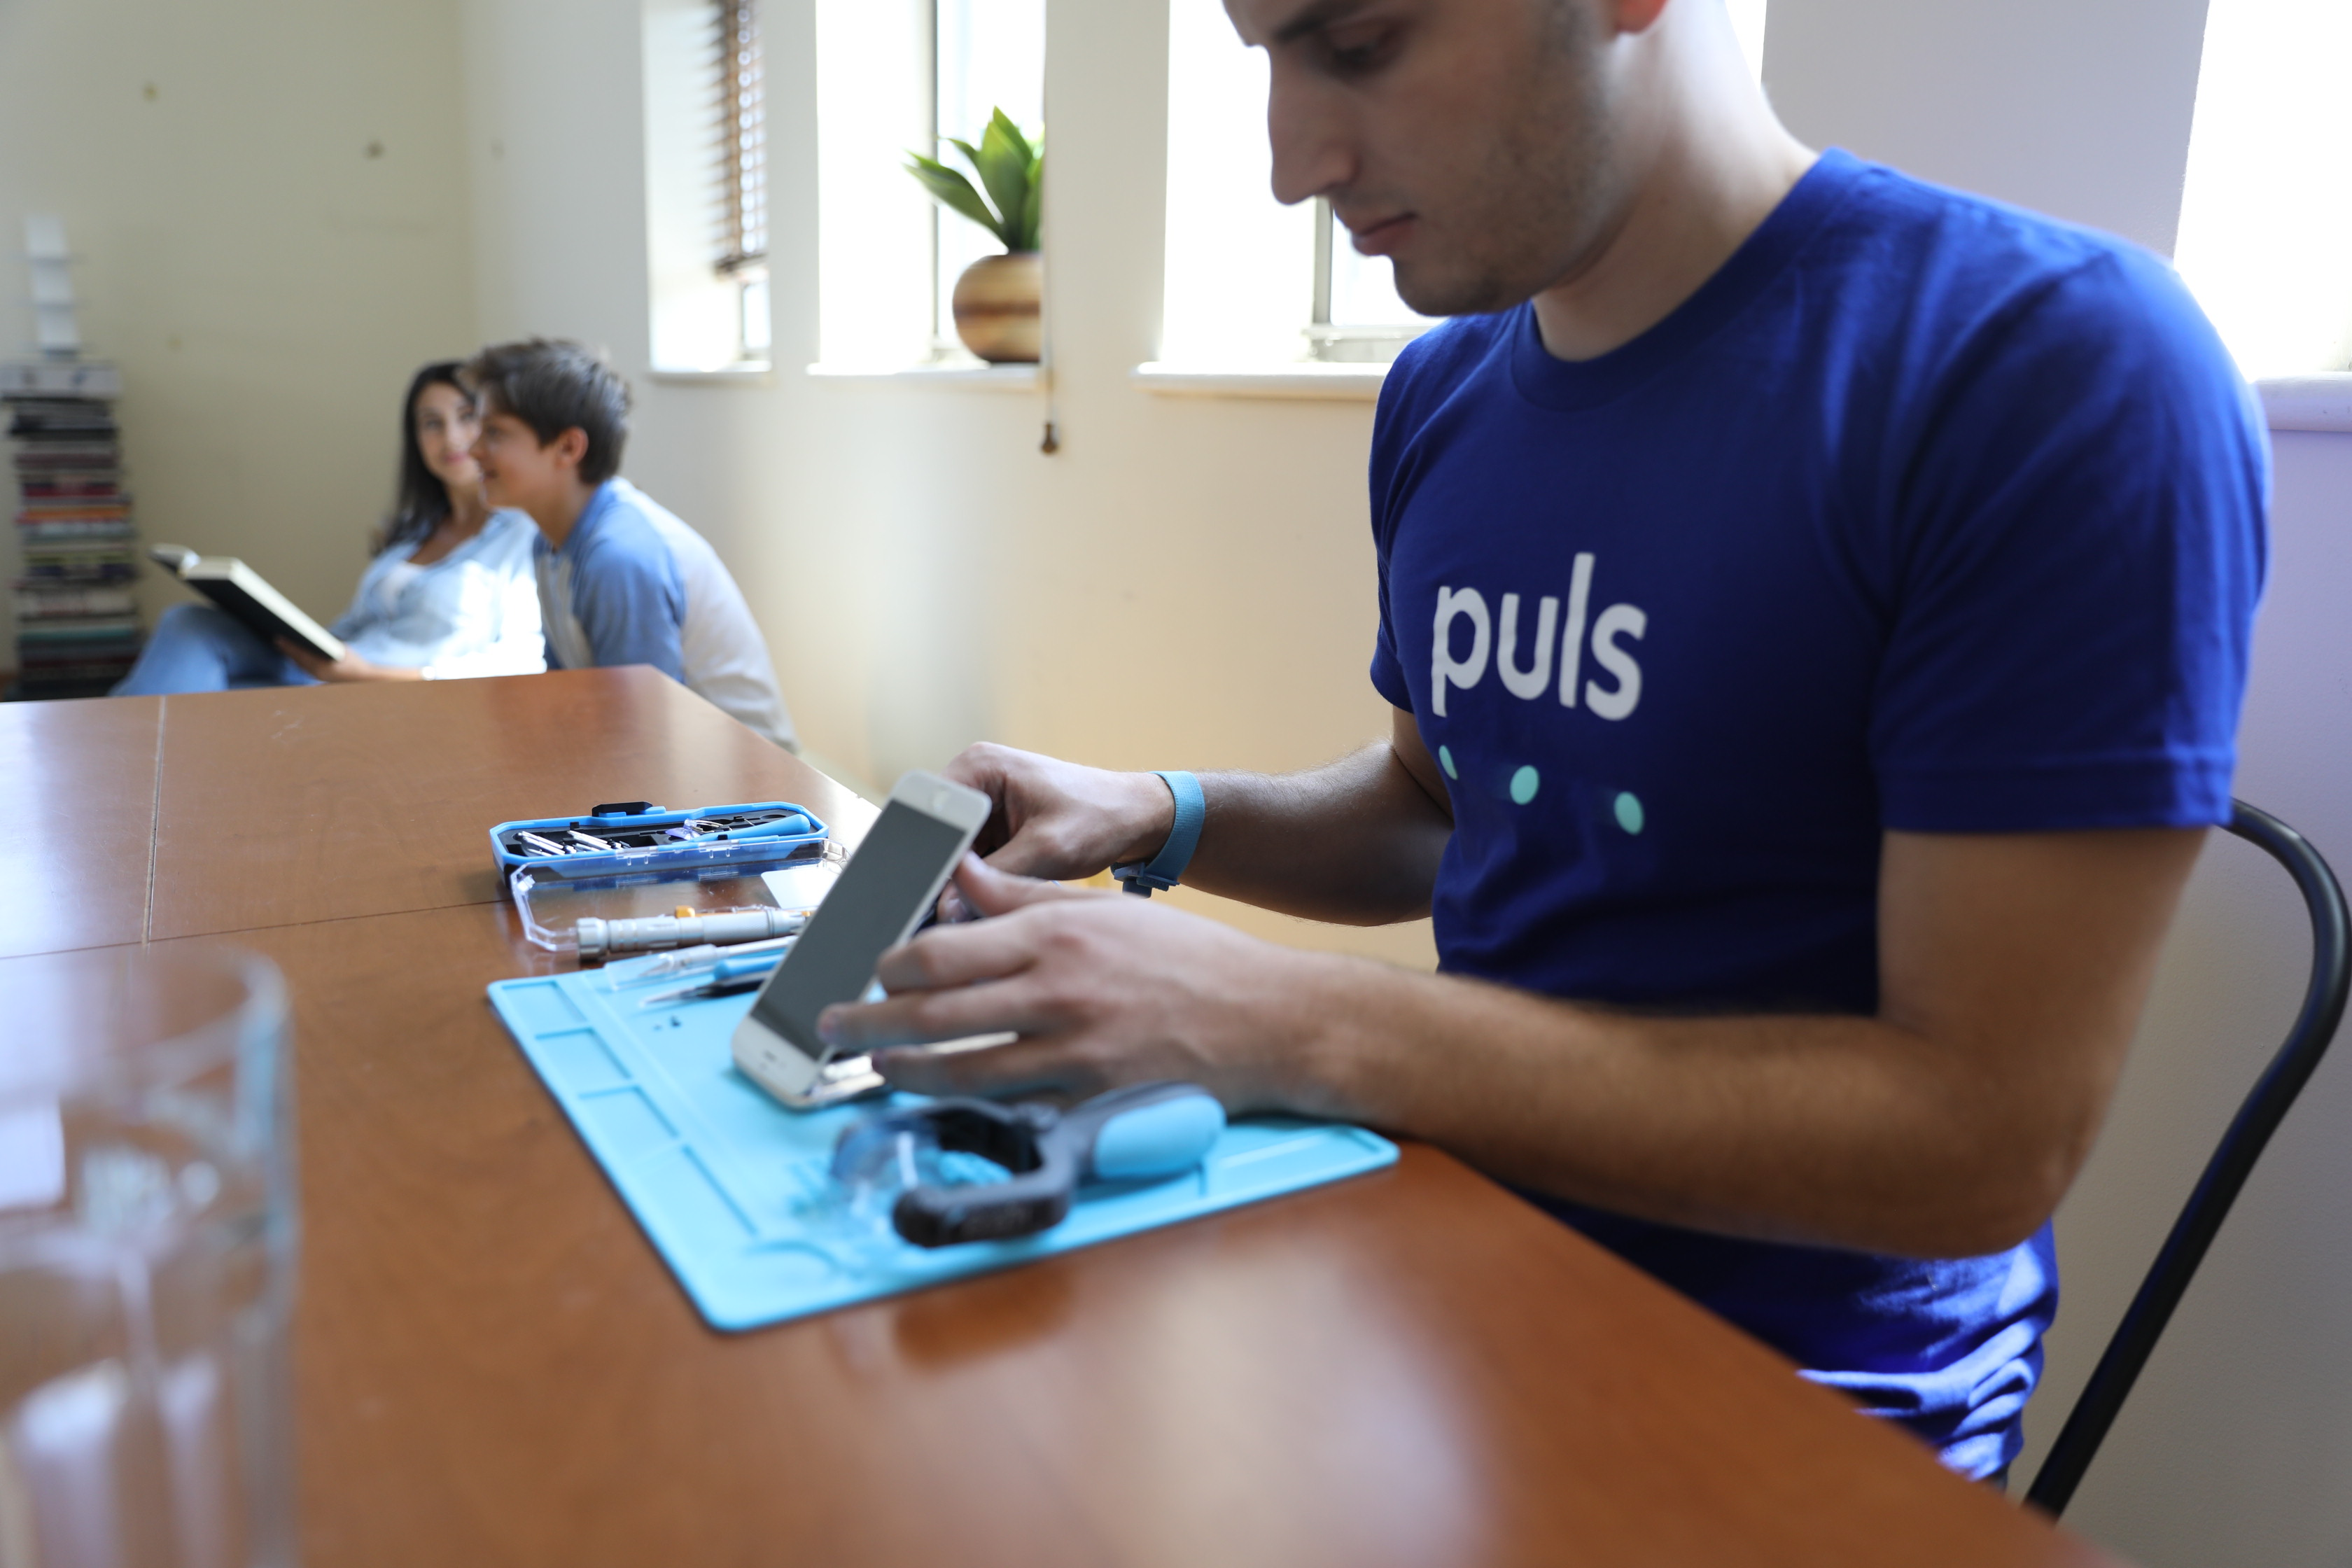 Puls technician repairing iPhone screen